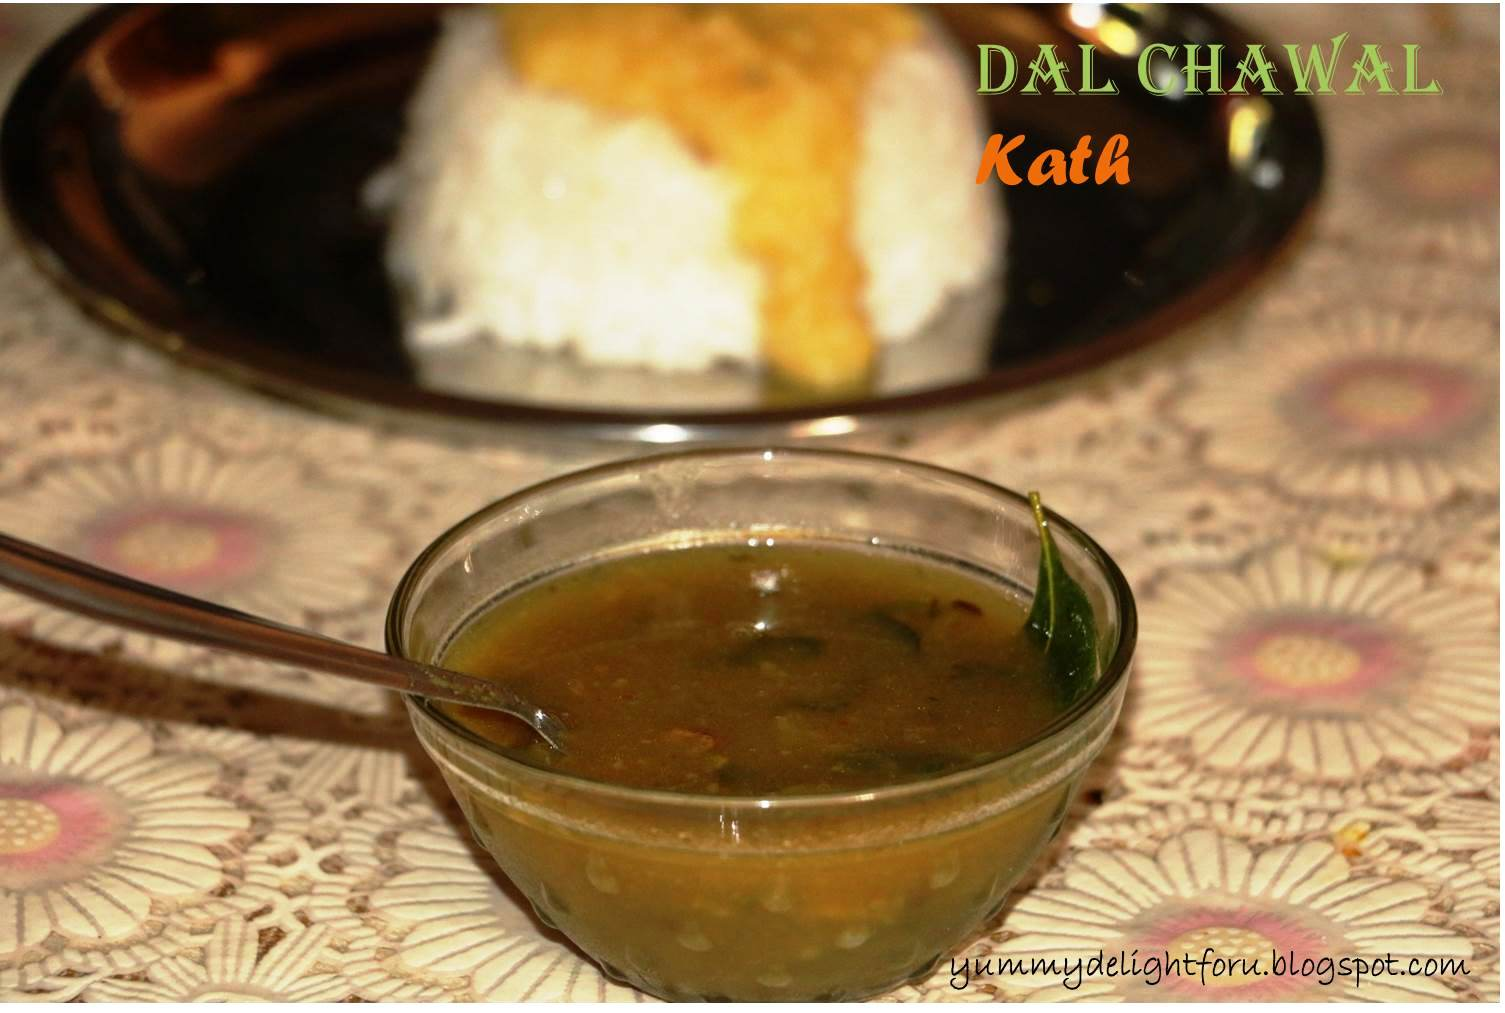 Yummy delight for u dal chawal kath recipe rajasthani cuisine dal chawal kath recipe rajasthani cuisine forumfinder Choice Image